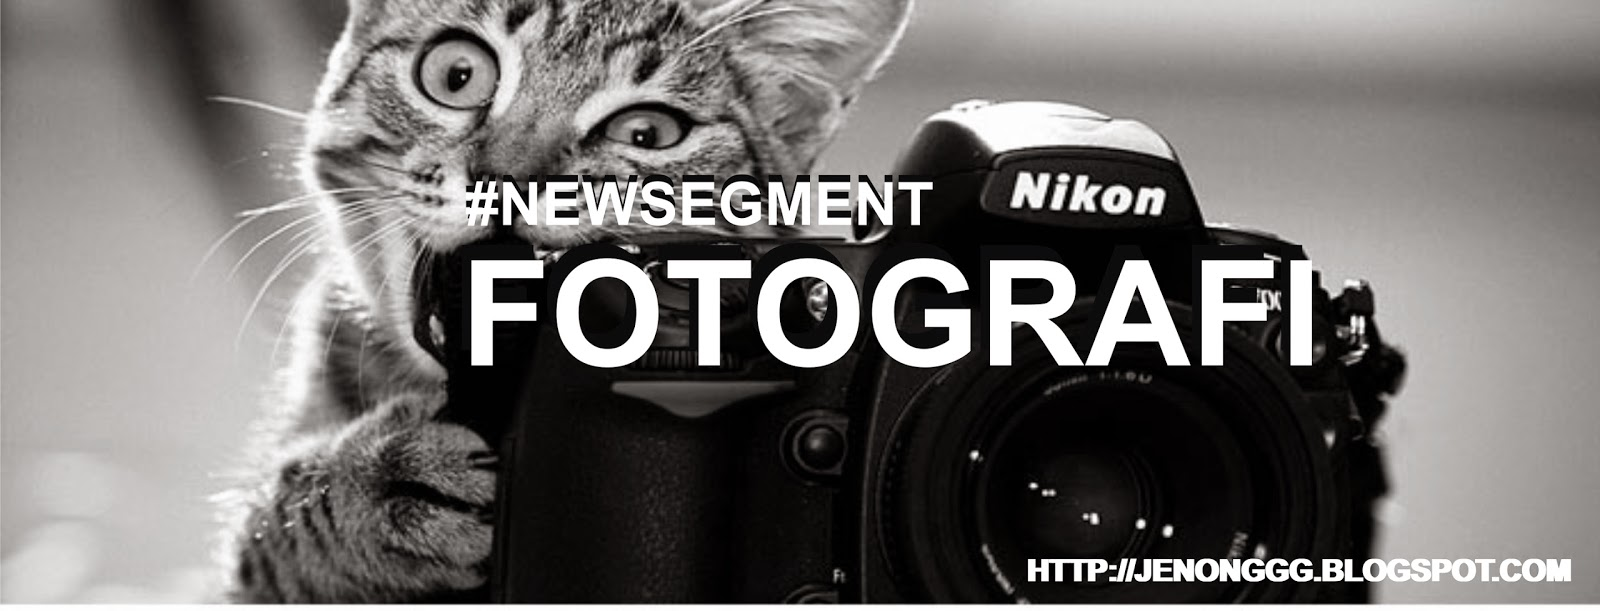 new, segment, fotografi, photography, fotografer, photographer, foto, komunitas fotografi, mataponsel, blogger, imas agustini, imas, agustini